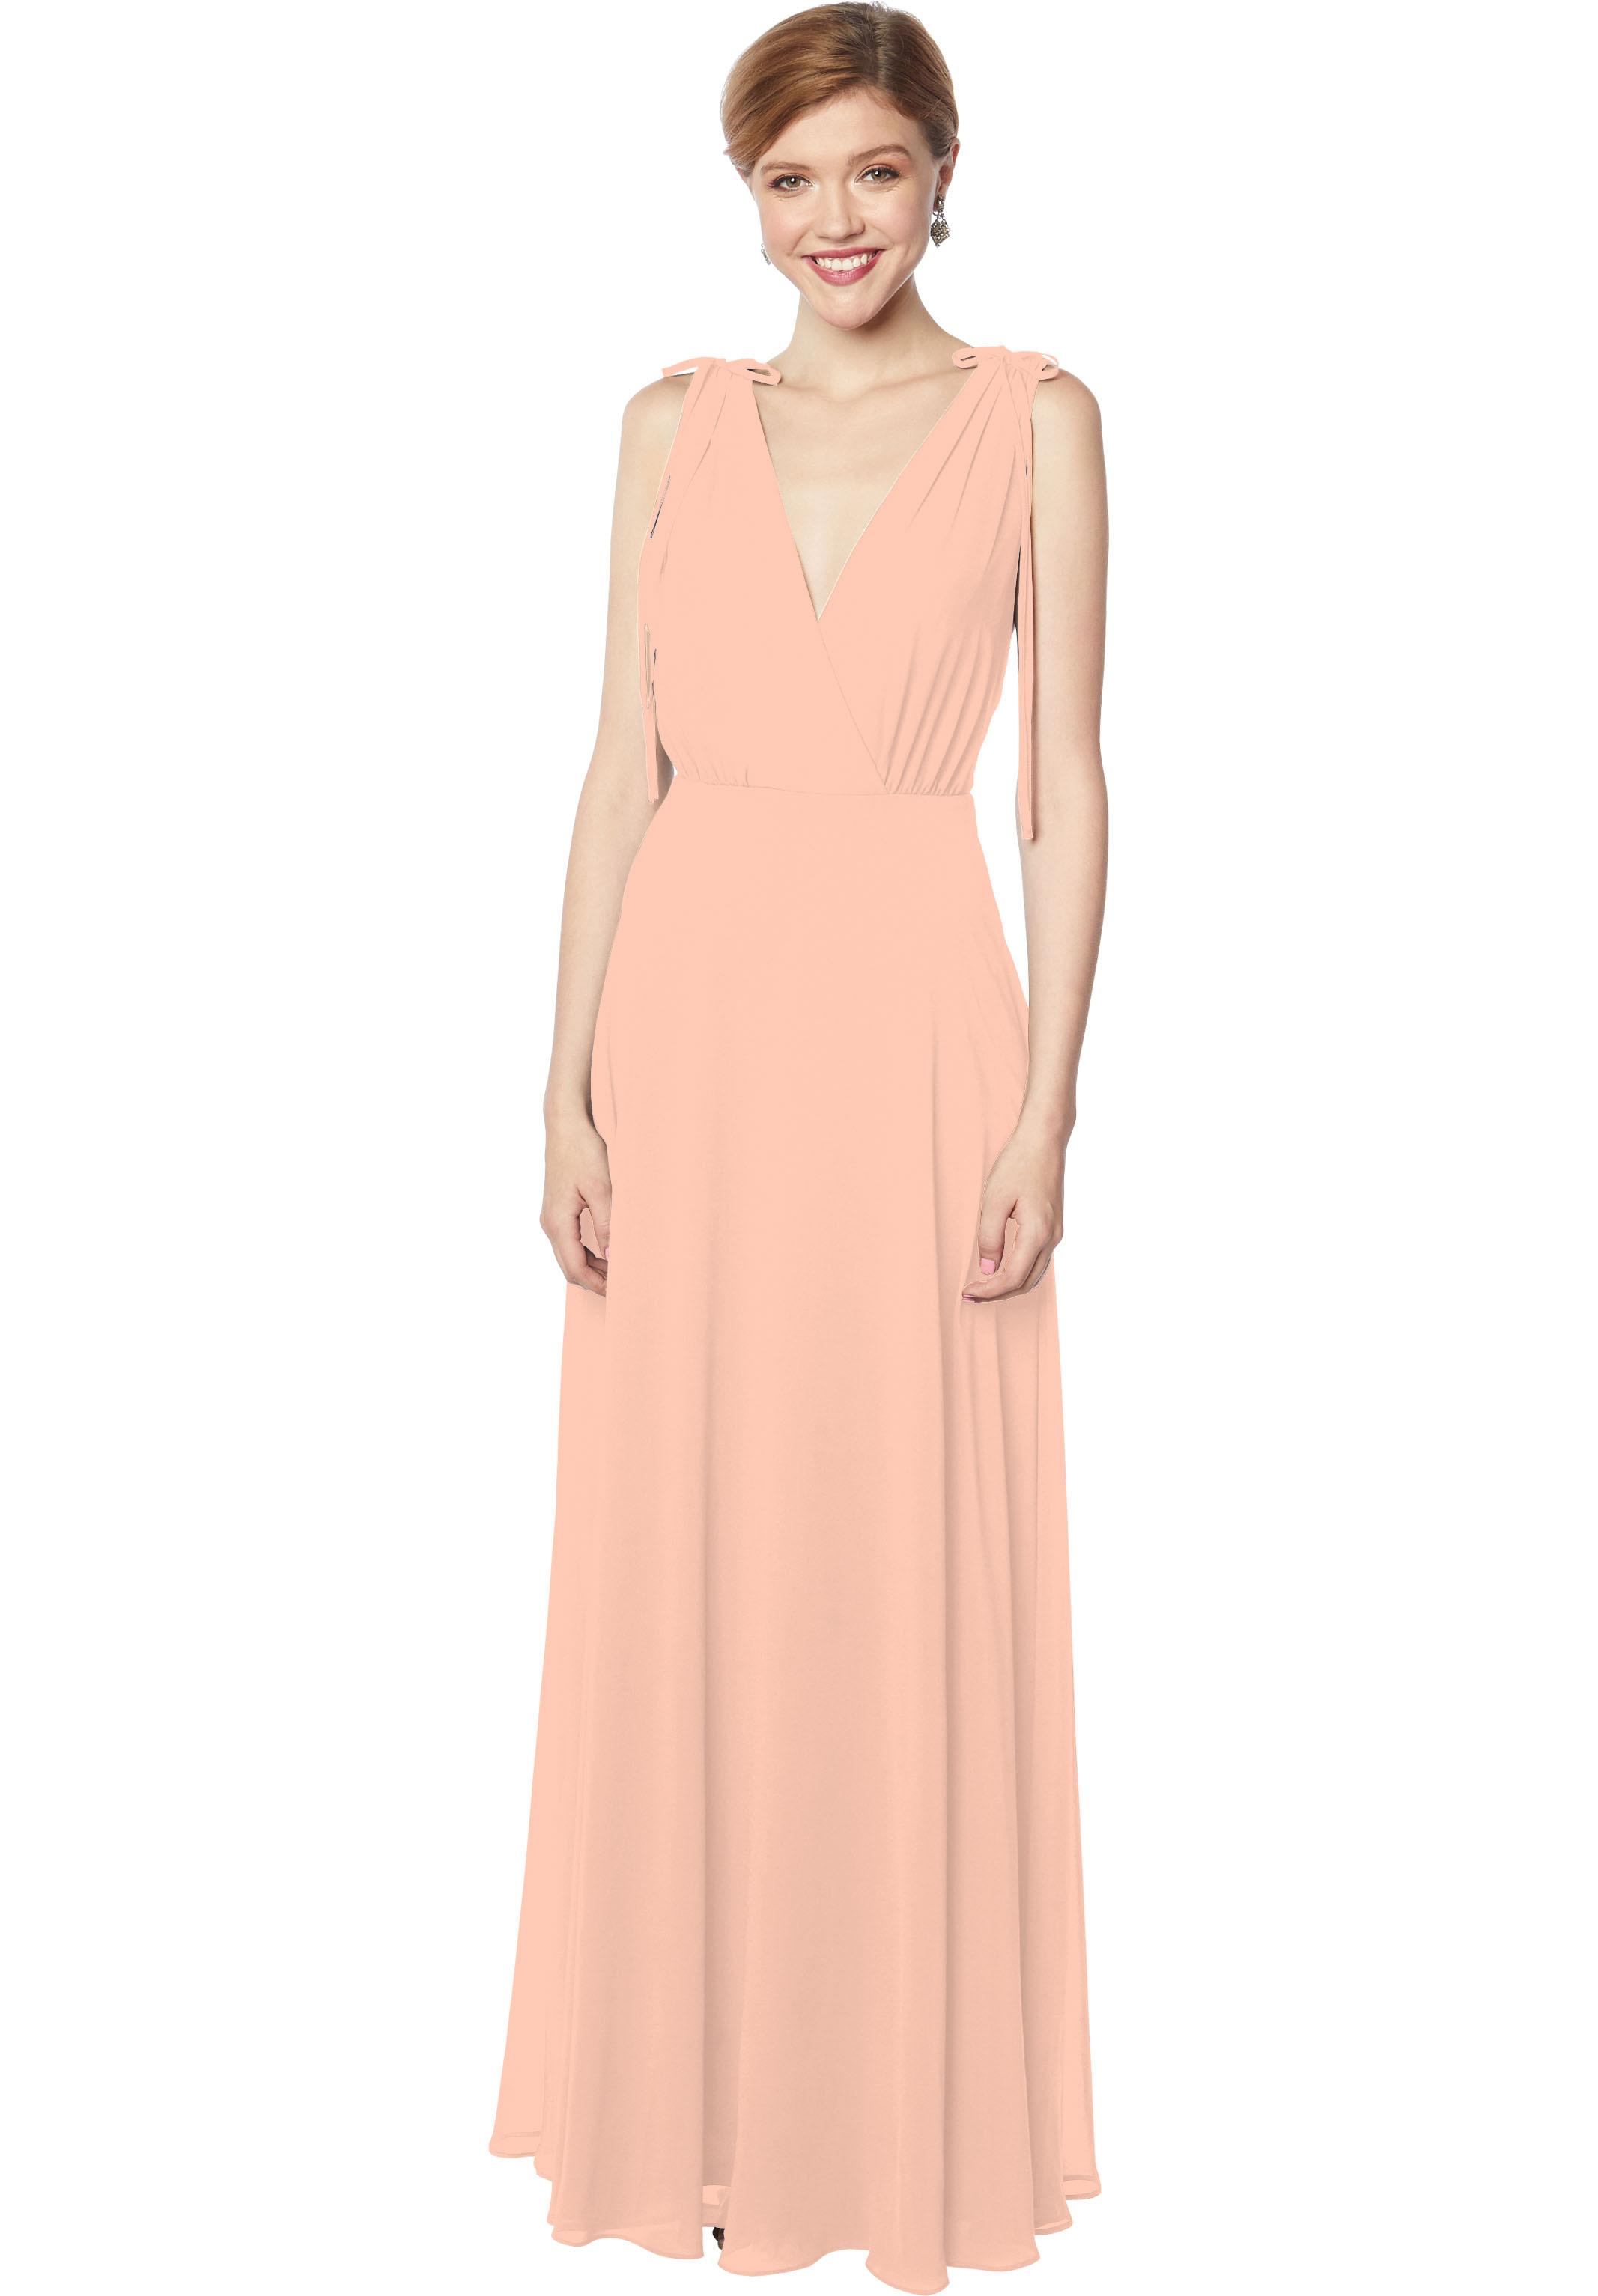 Bill Levkoff PEACH Chiffon Sleeveless A-line gown, $178.00 Front